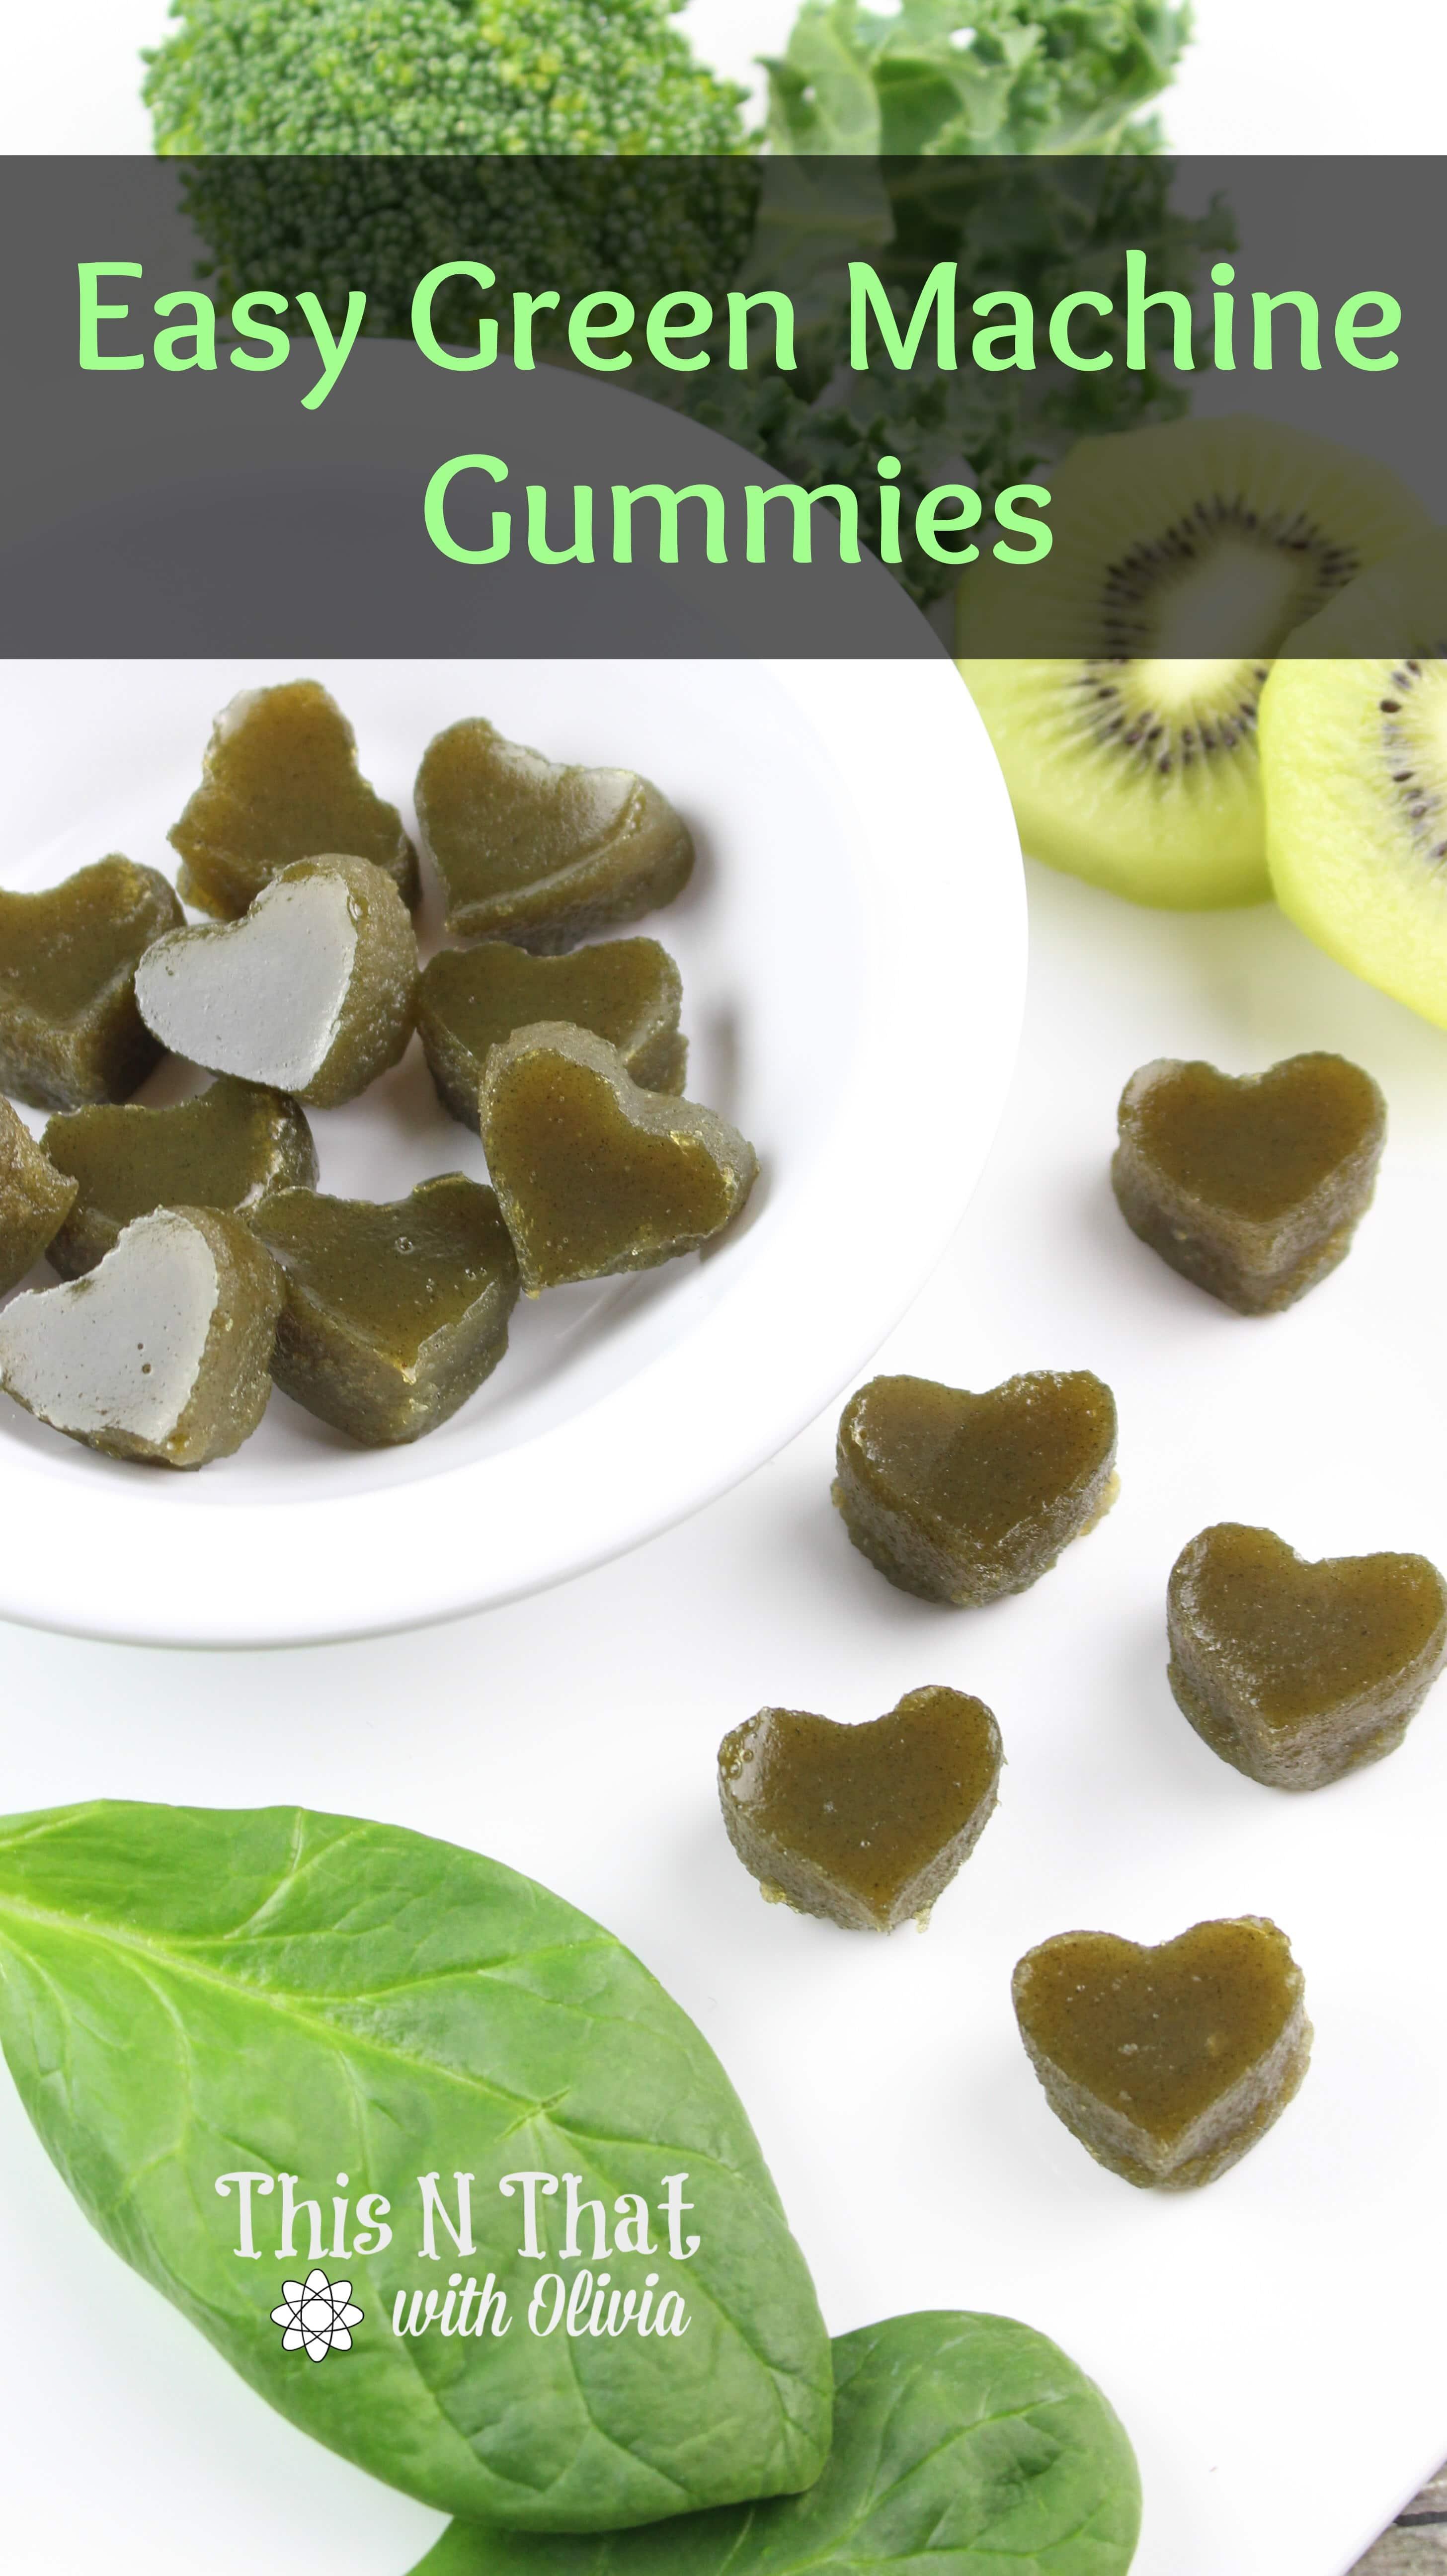 Easy Green Machine Gummies